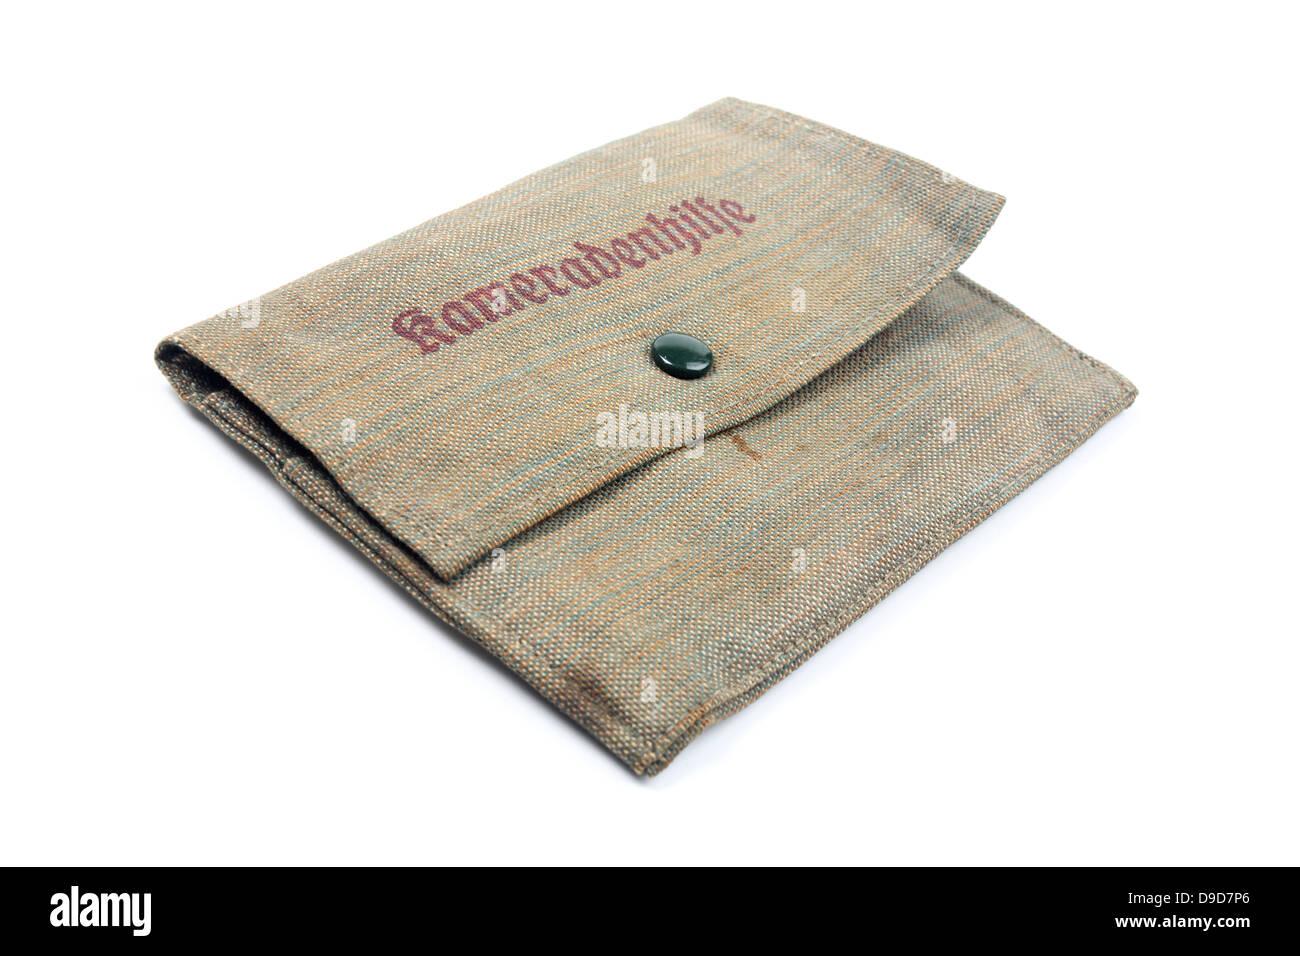 Material antiguo de bolsillo con la ayuda de la etiqueta - Companion Imagen De Stock